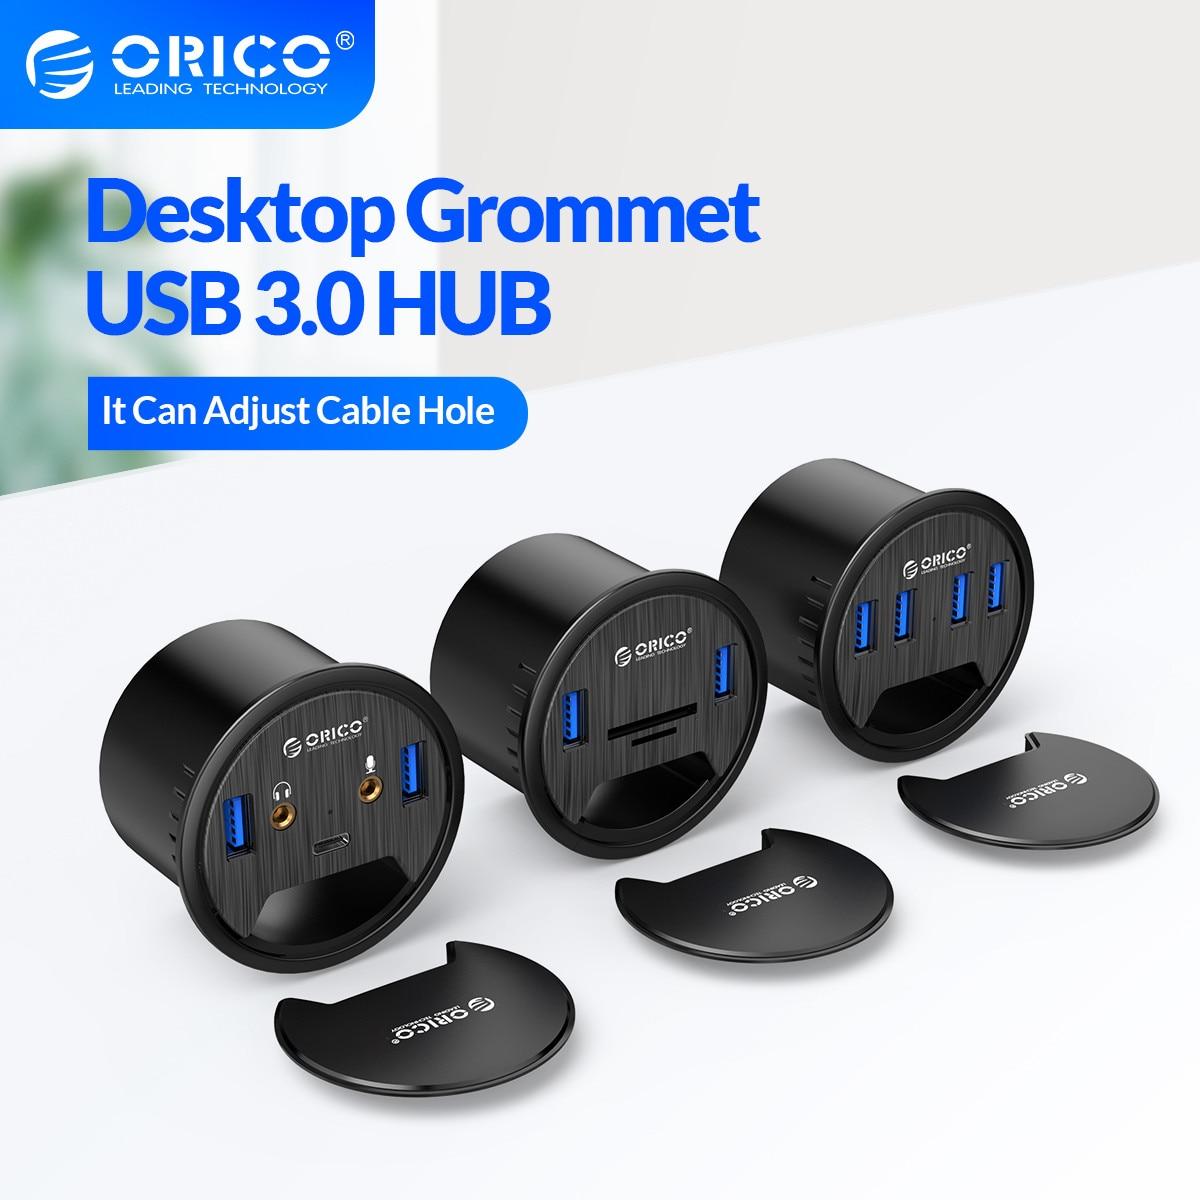 Hub USB do biurka ORICO USB 3.0 HUB za $11.99 / ~44zł